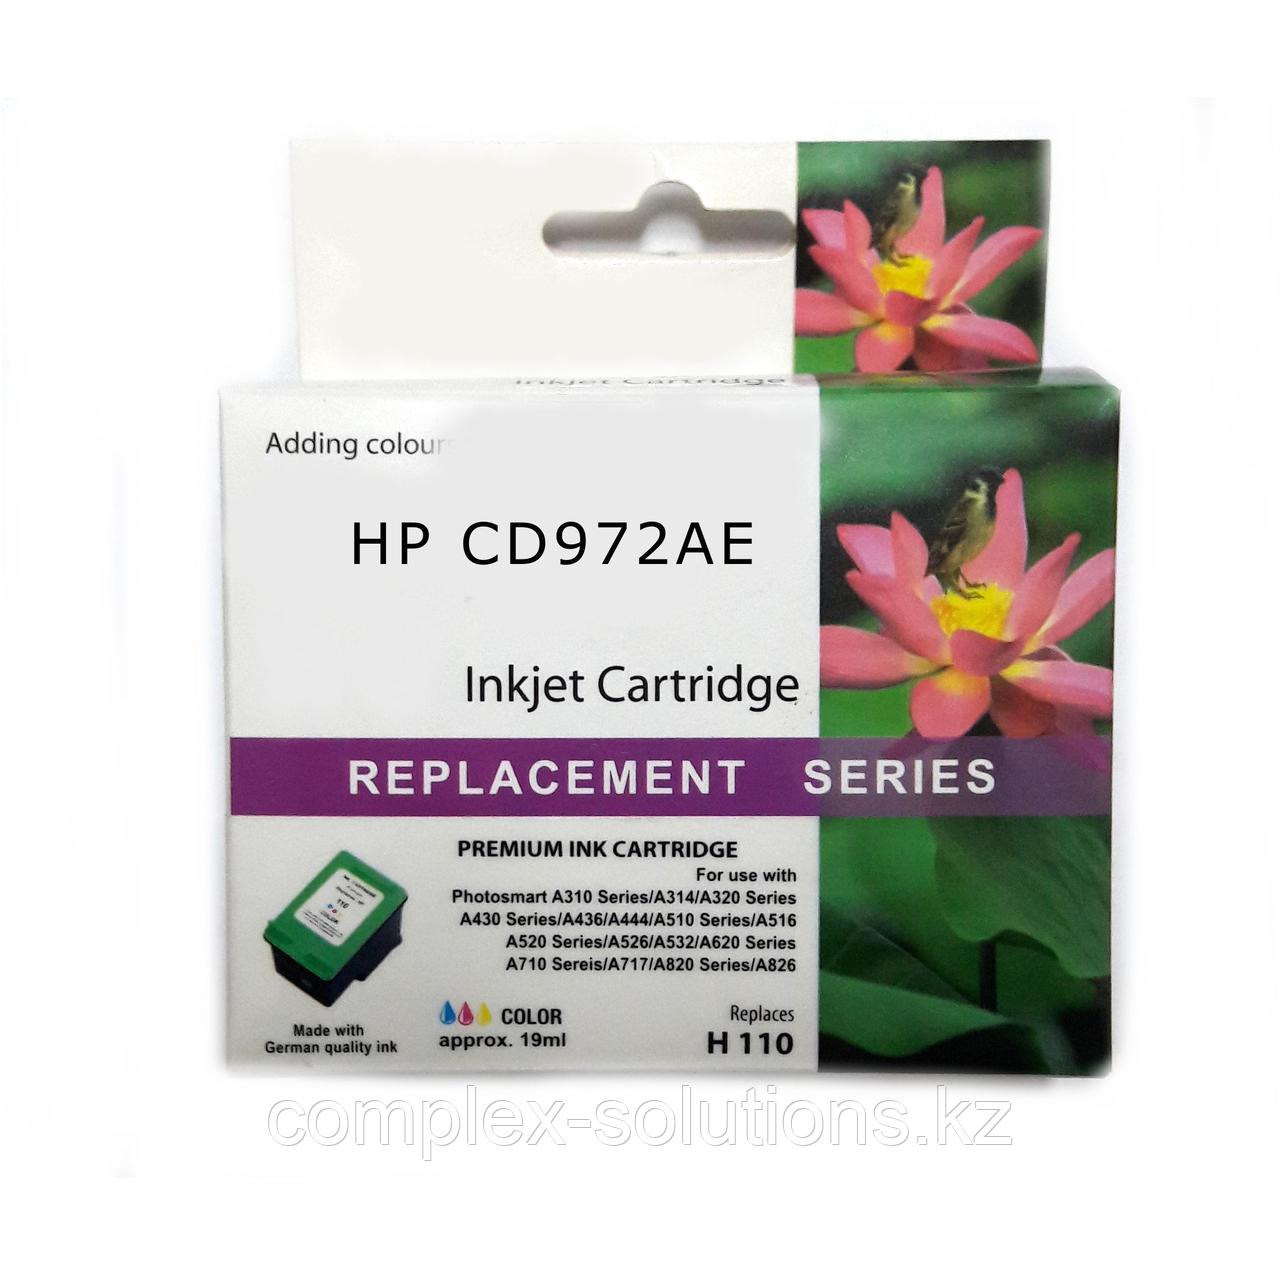 Картридж H-P CD972AE Cyan №920 JET TEK   [качественный дубликат]